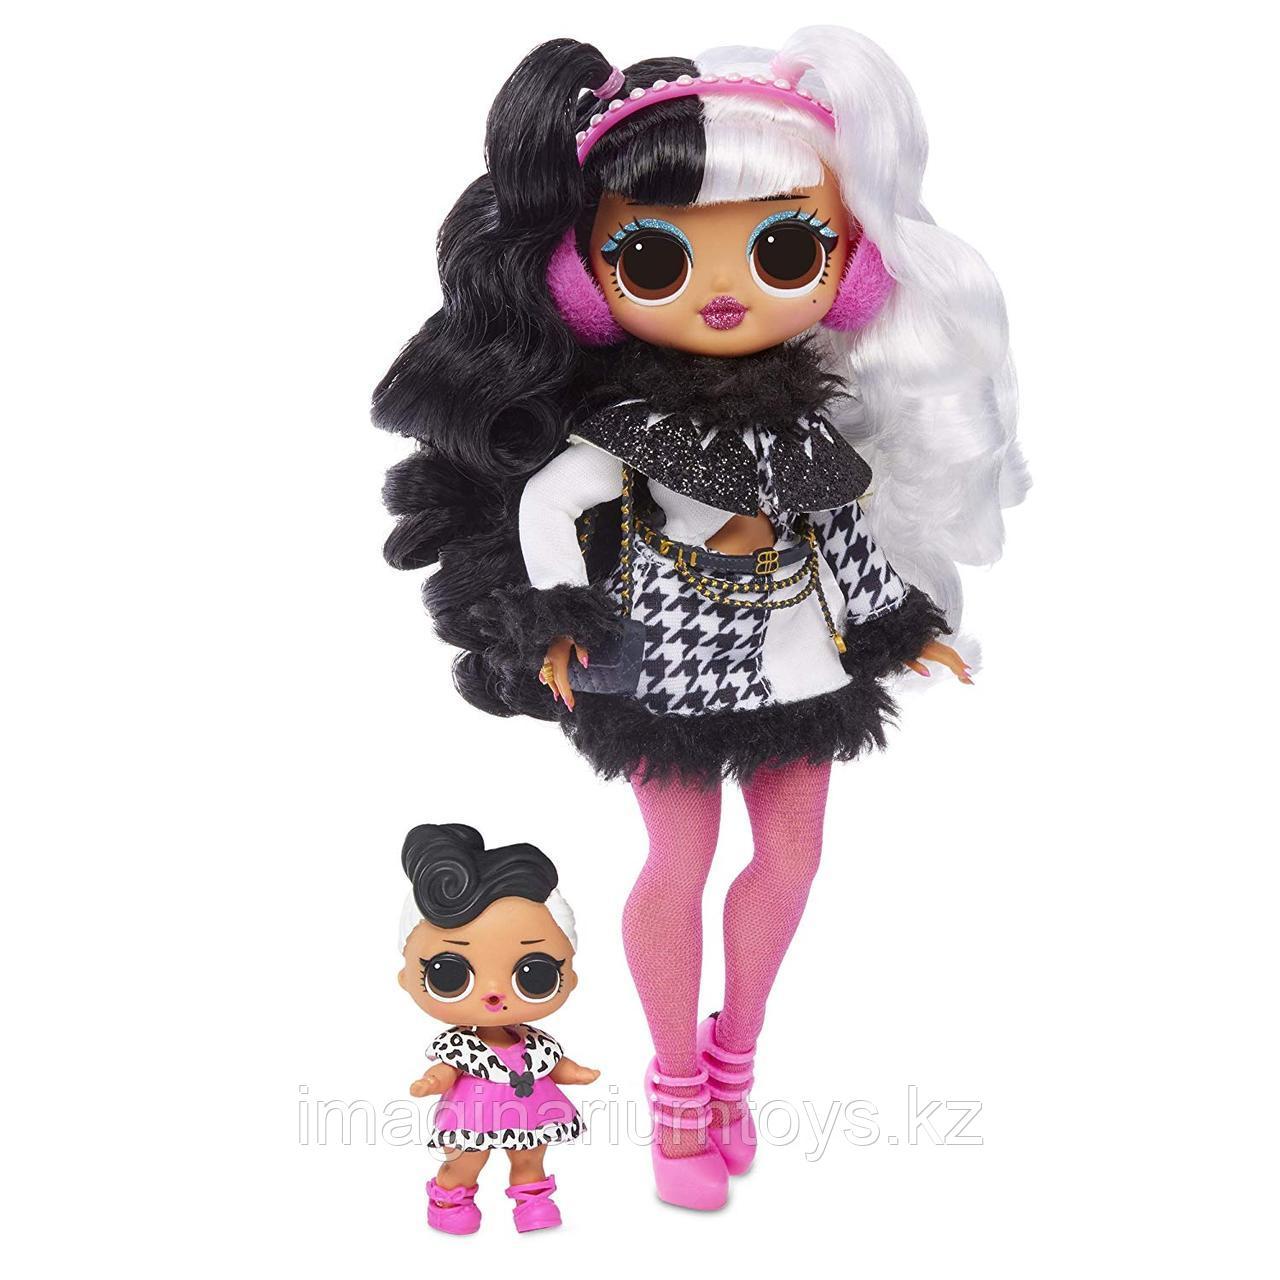 LOL OMG Winter Disco Dollie большая кукла ЛОЛ 30 см Долли